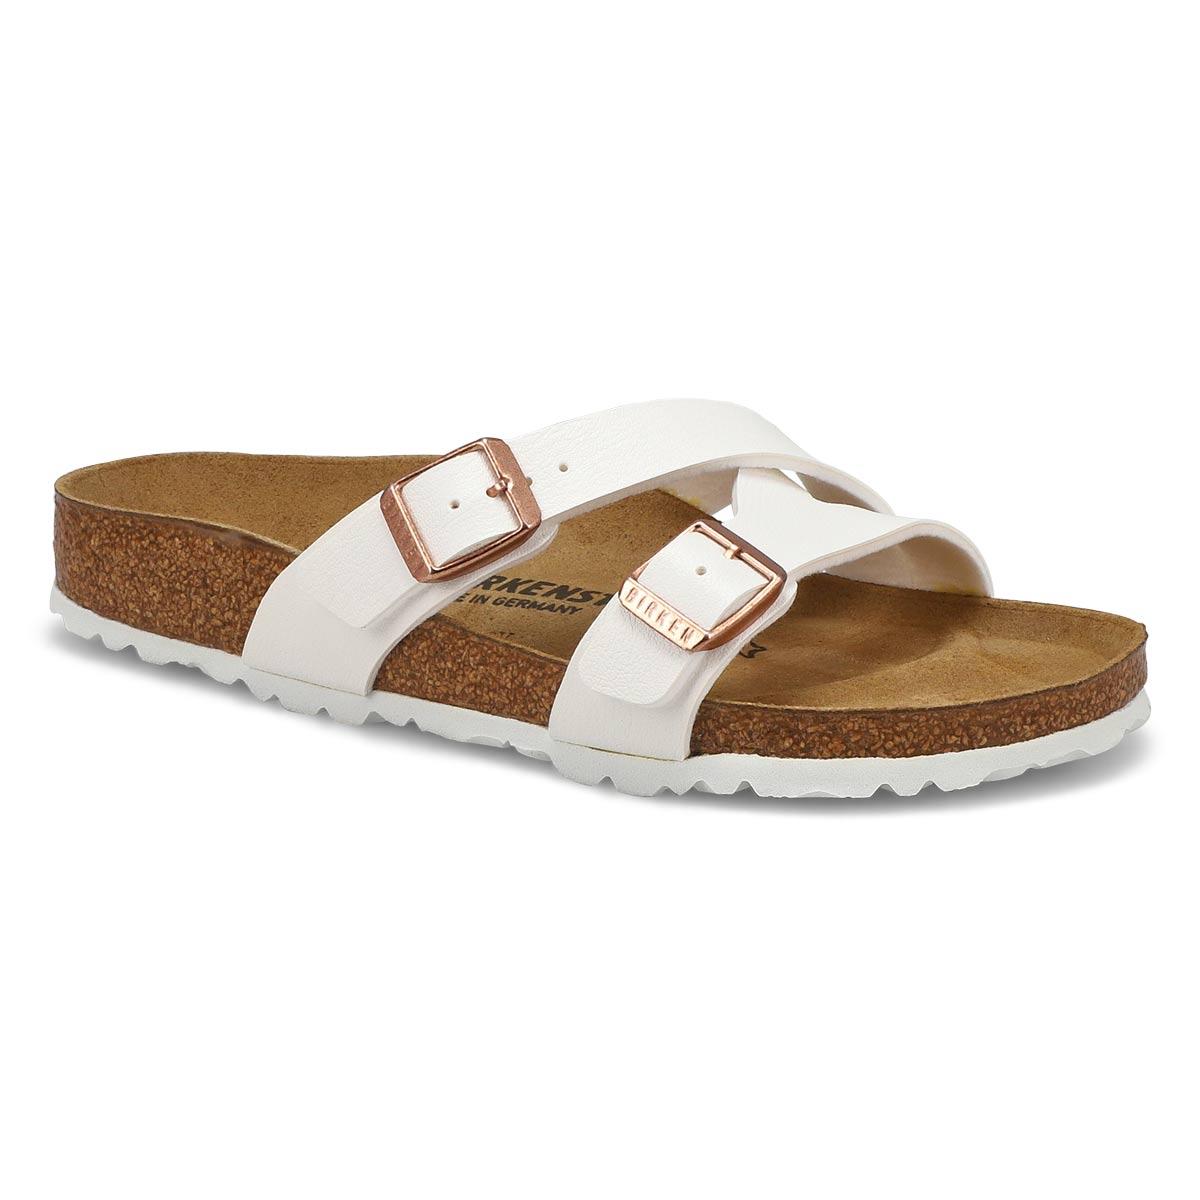 Sandales YAO, ÉTROIT, blanc, femmes